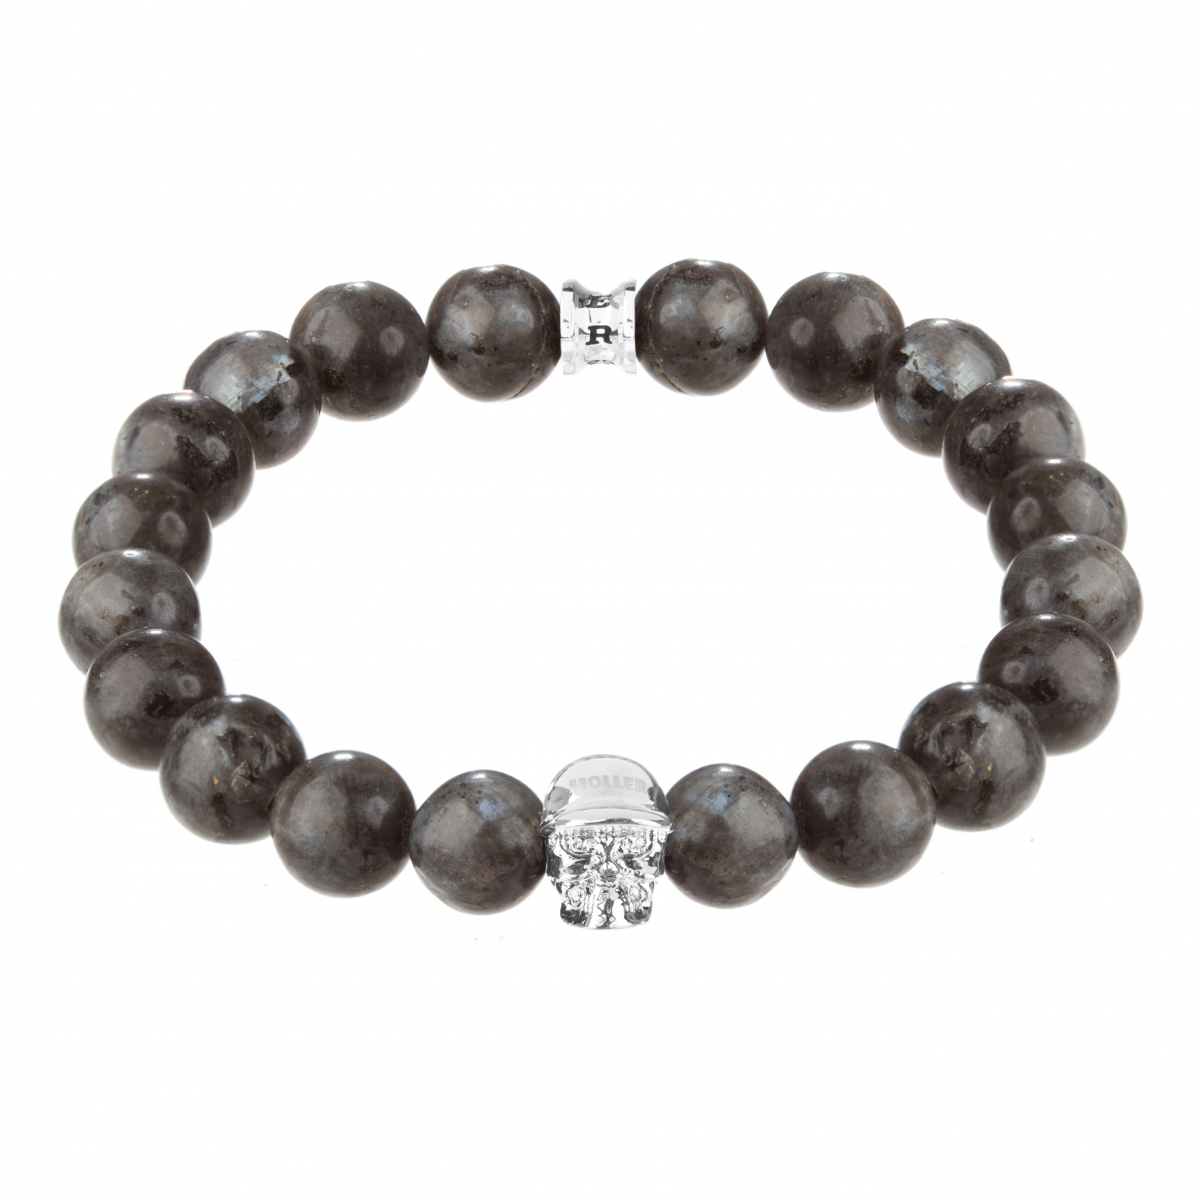 Jefferson Silver Polished Skull / 10mm Grey Natural Black Larvikite Natural Stone Bracelet